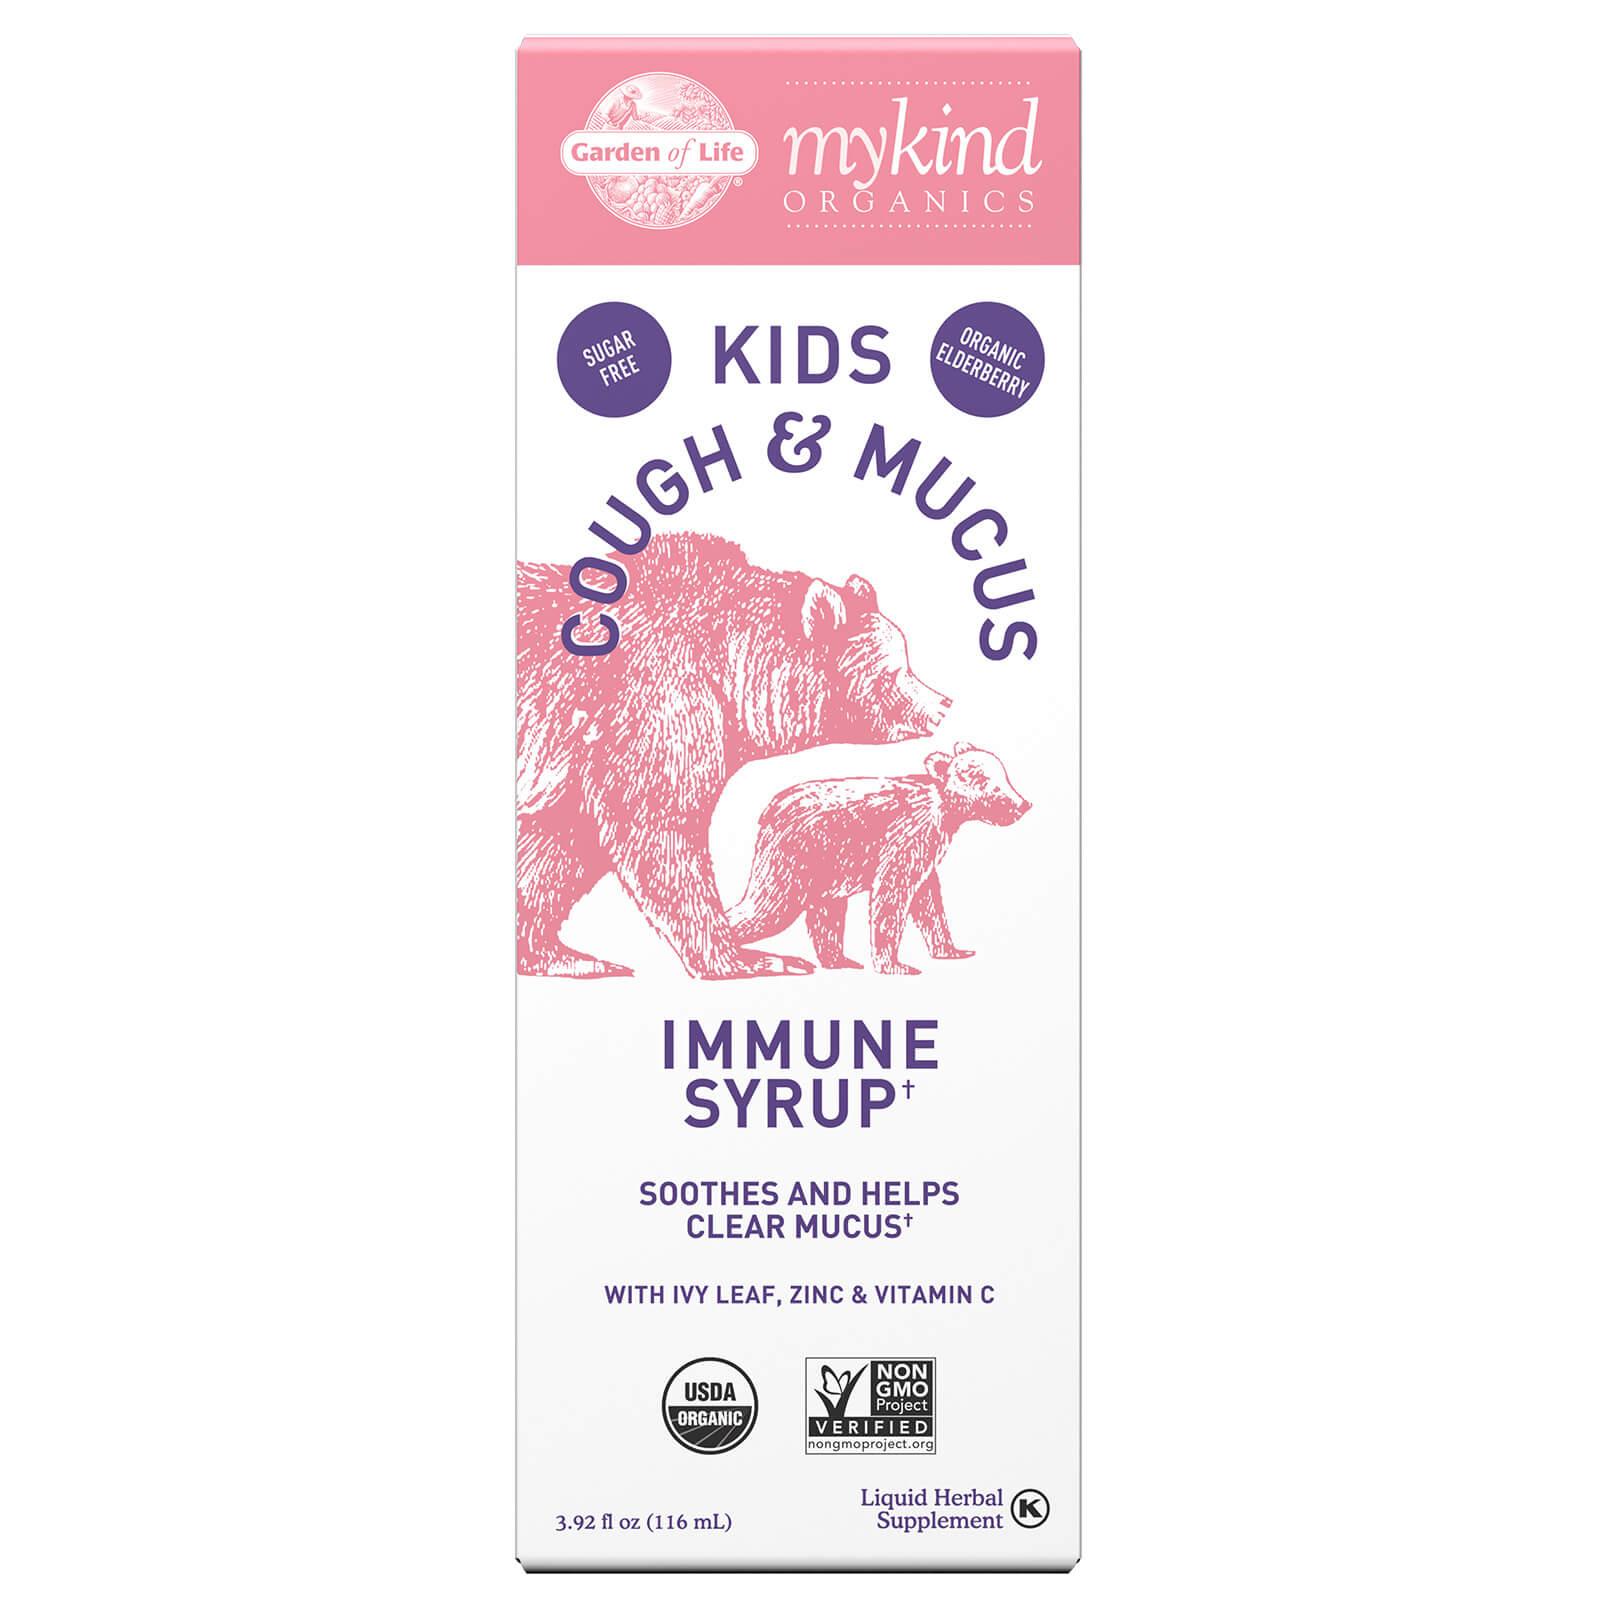 Mykind Organics Kids Vlierbessen & Slaap immuunsiroop - 116 ml